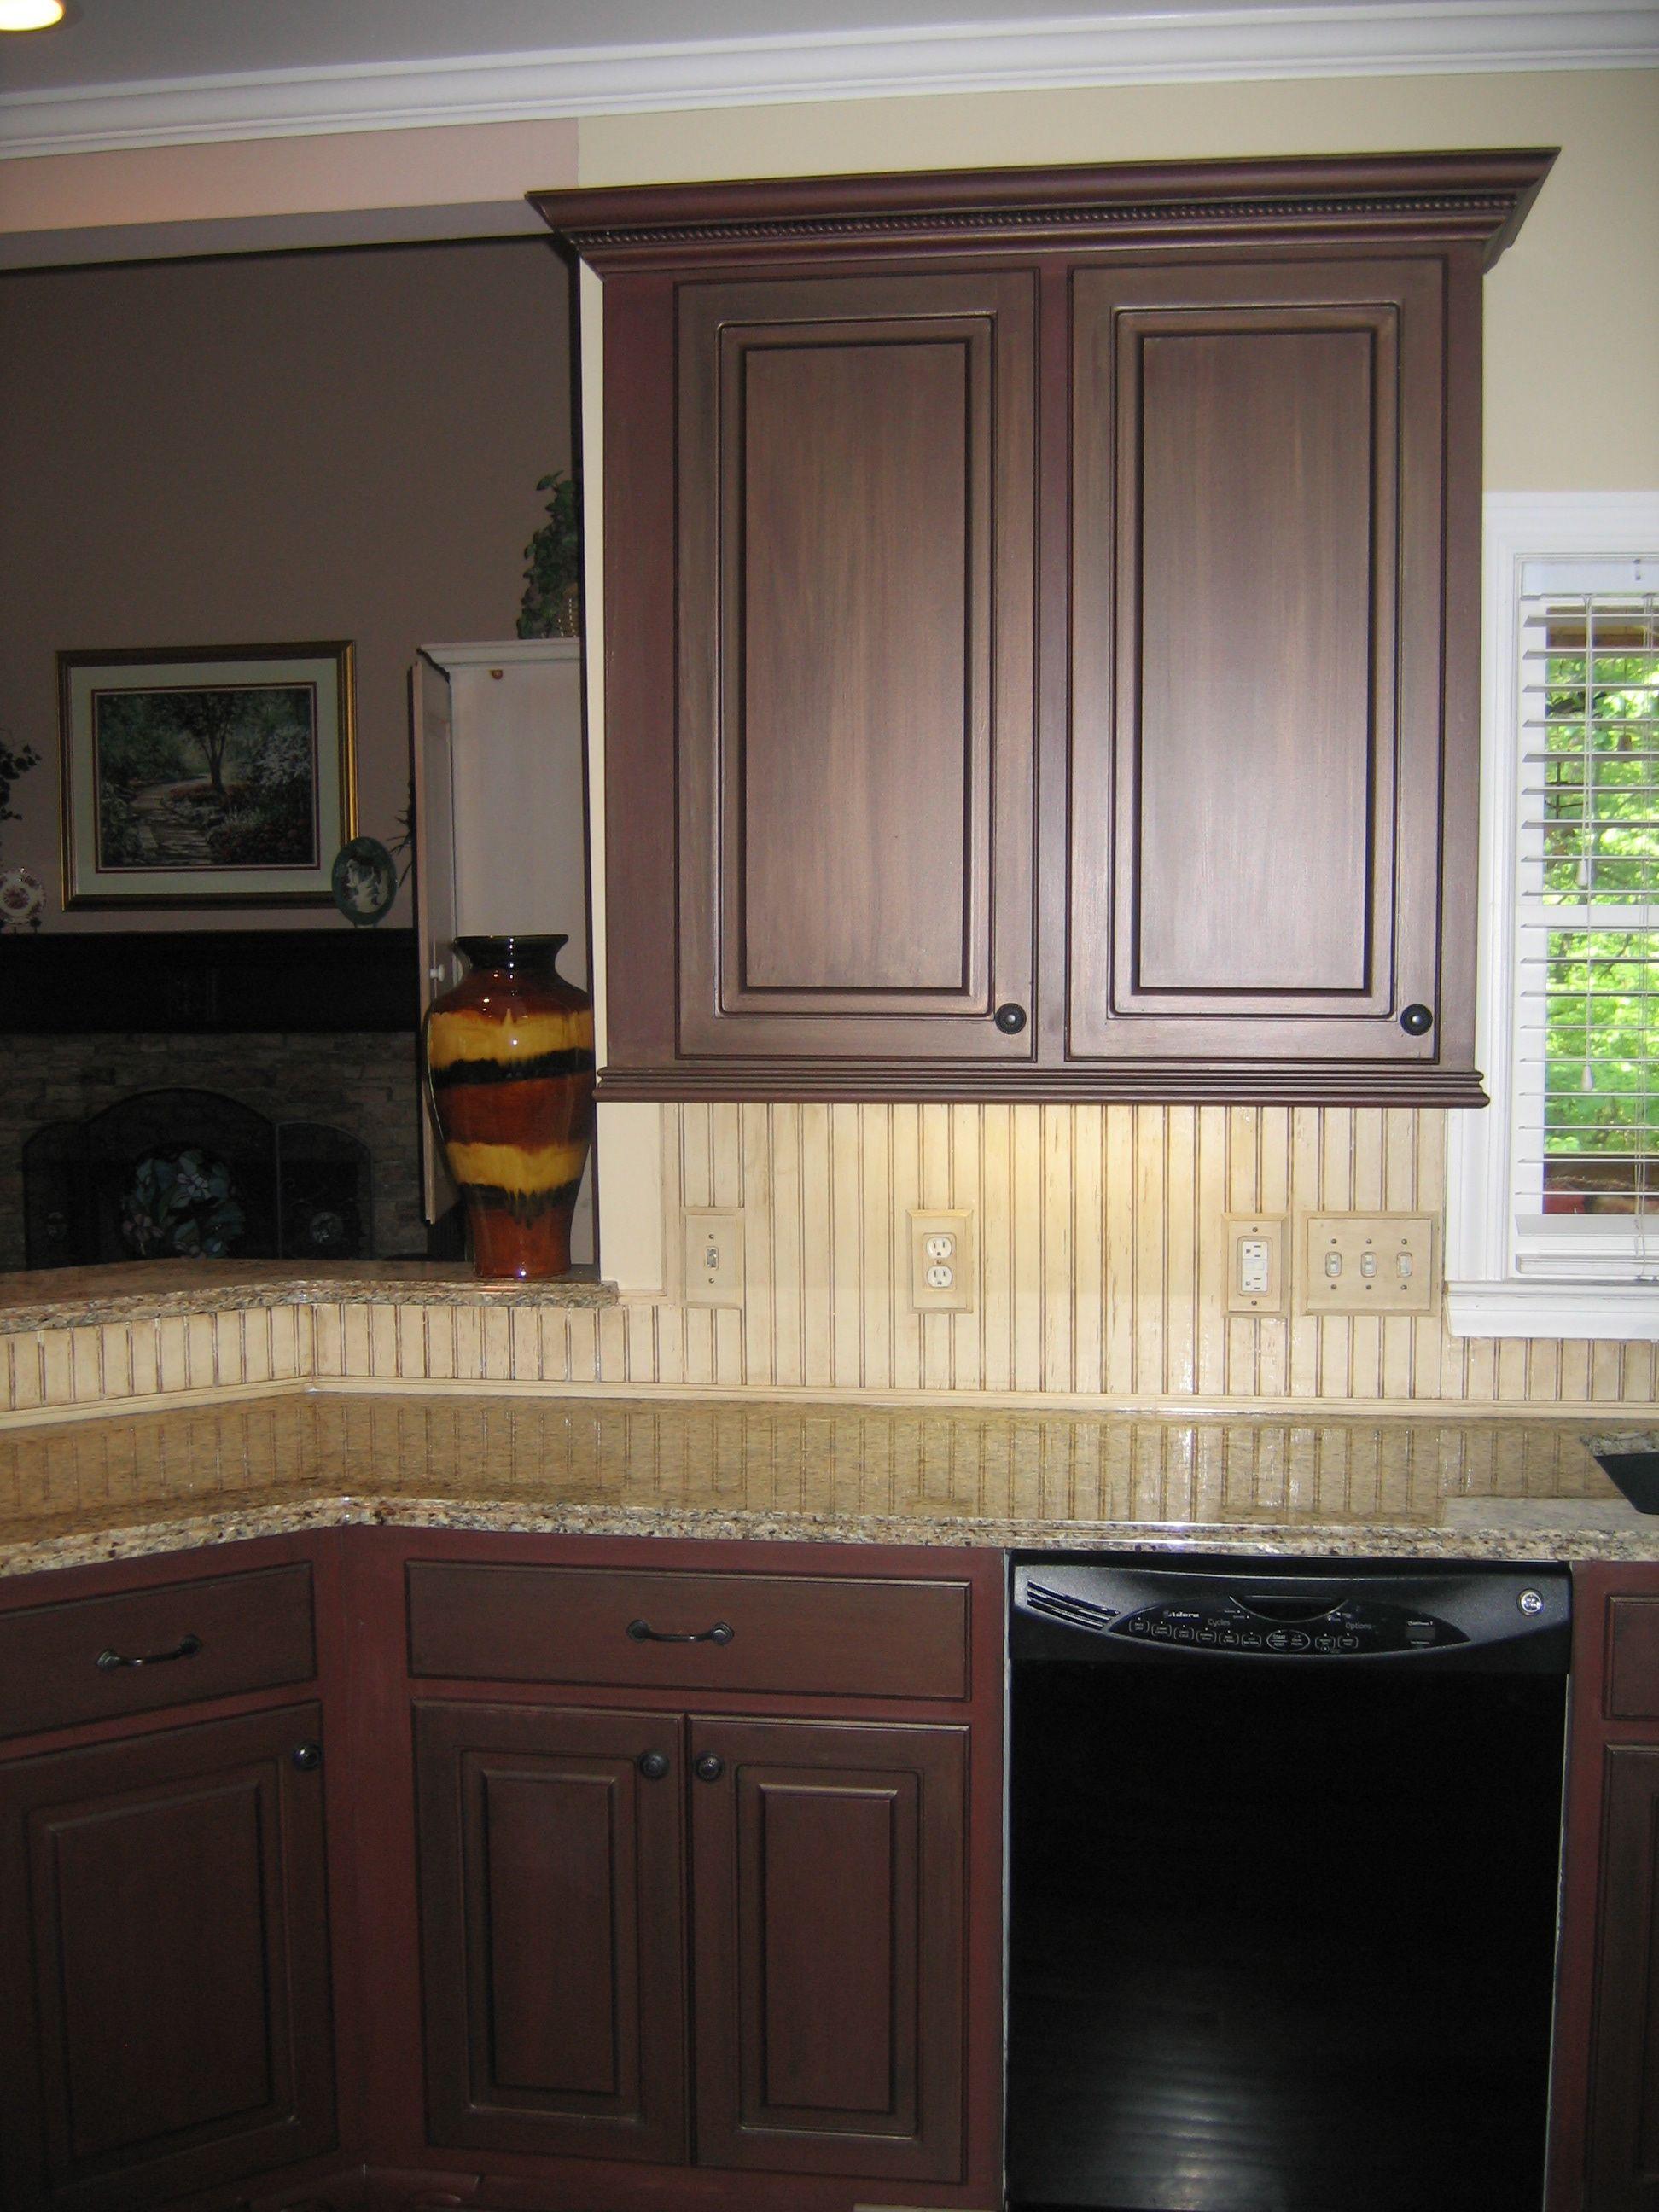 Best Painted Cabinets Beadboard Backsplash Kitchen Concepts 400 x 300